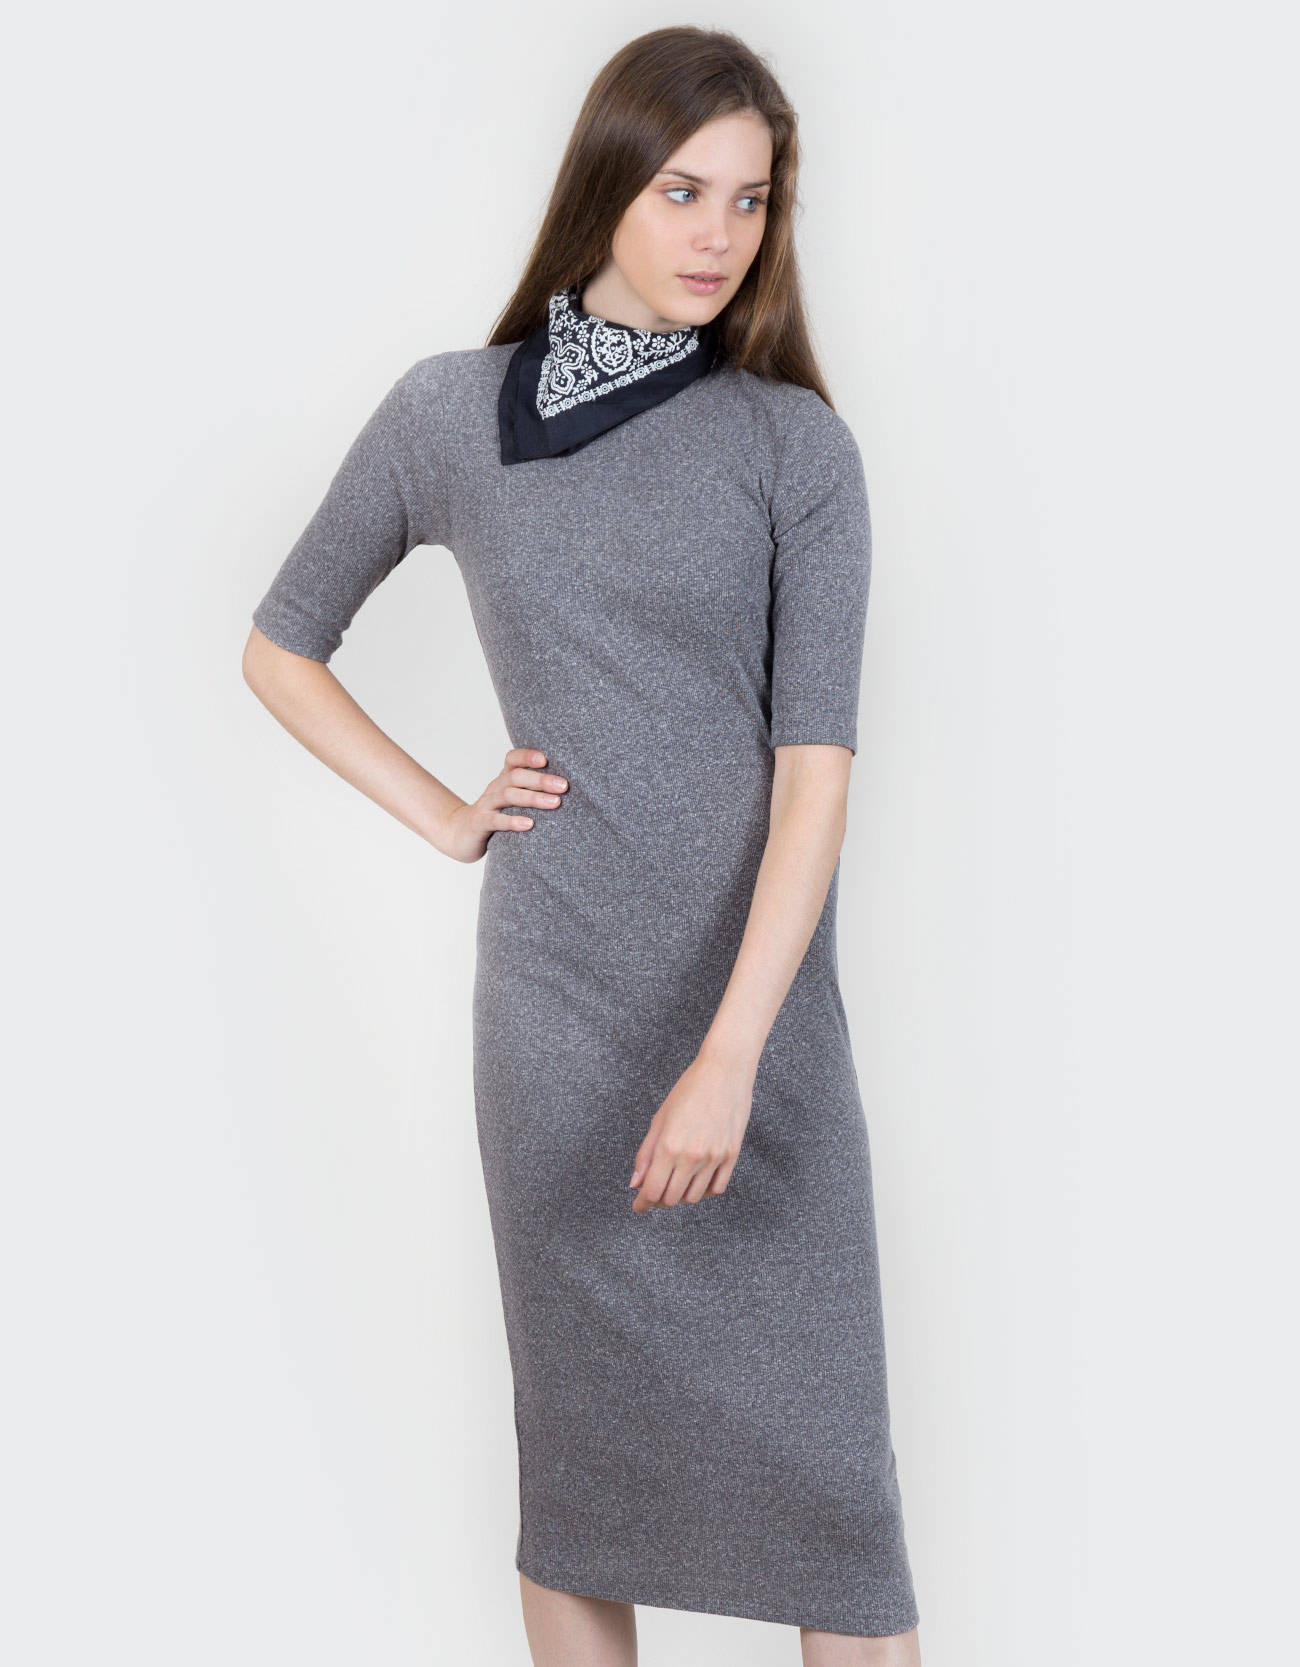 Tendencias Y 14 ModaEstilo – De Shana Vestidos Estilos Moda QChdtxsrB